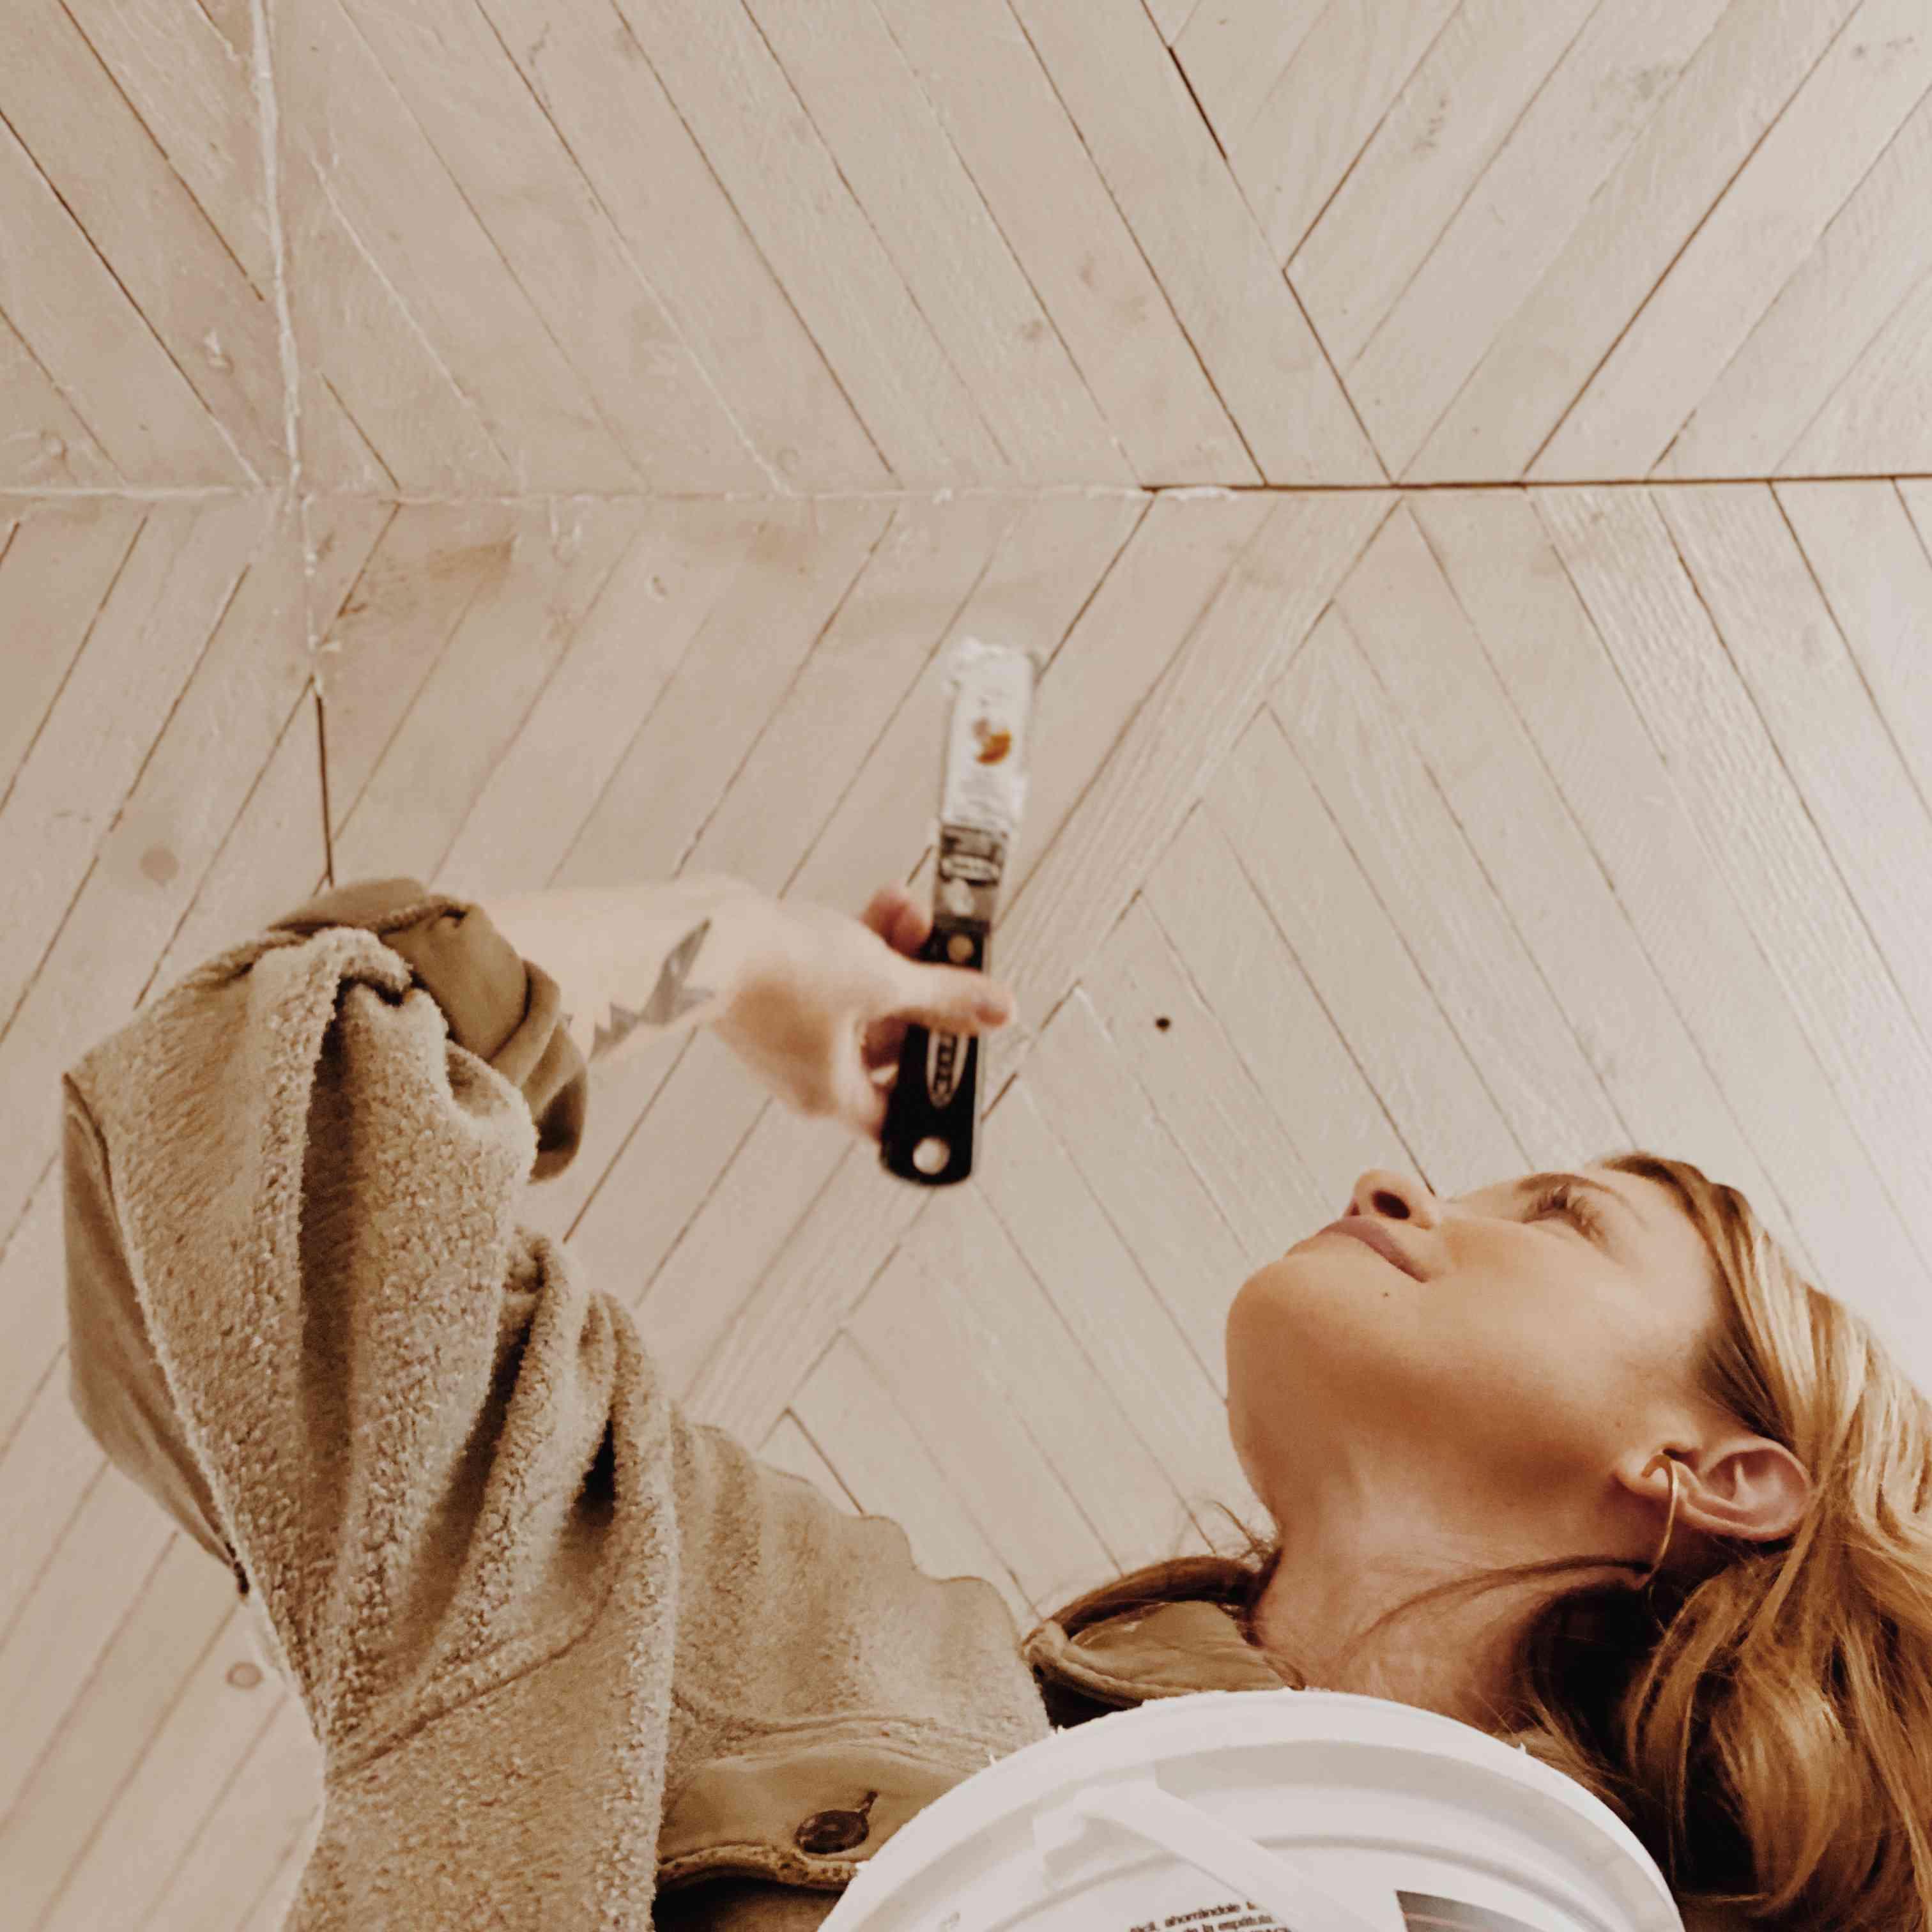 Aleksandra Zee working on ceiling installation in Sonoma, California